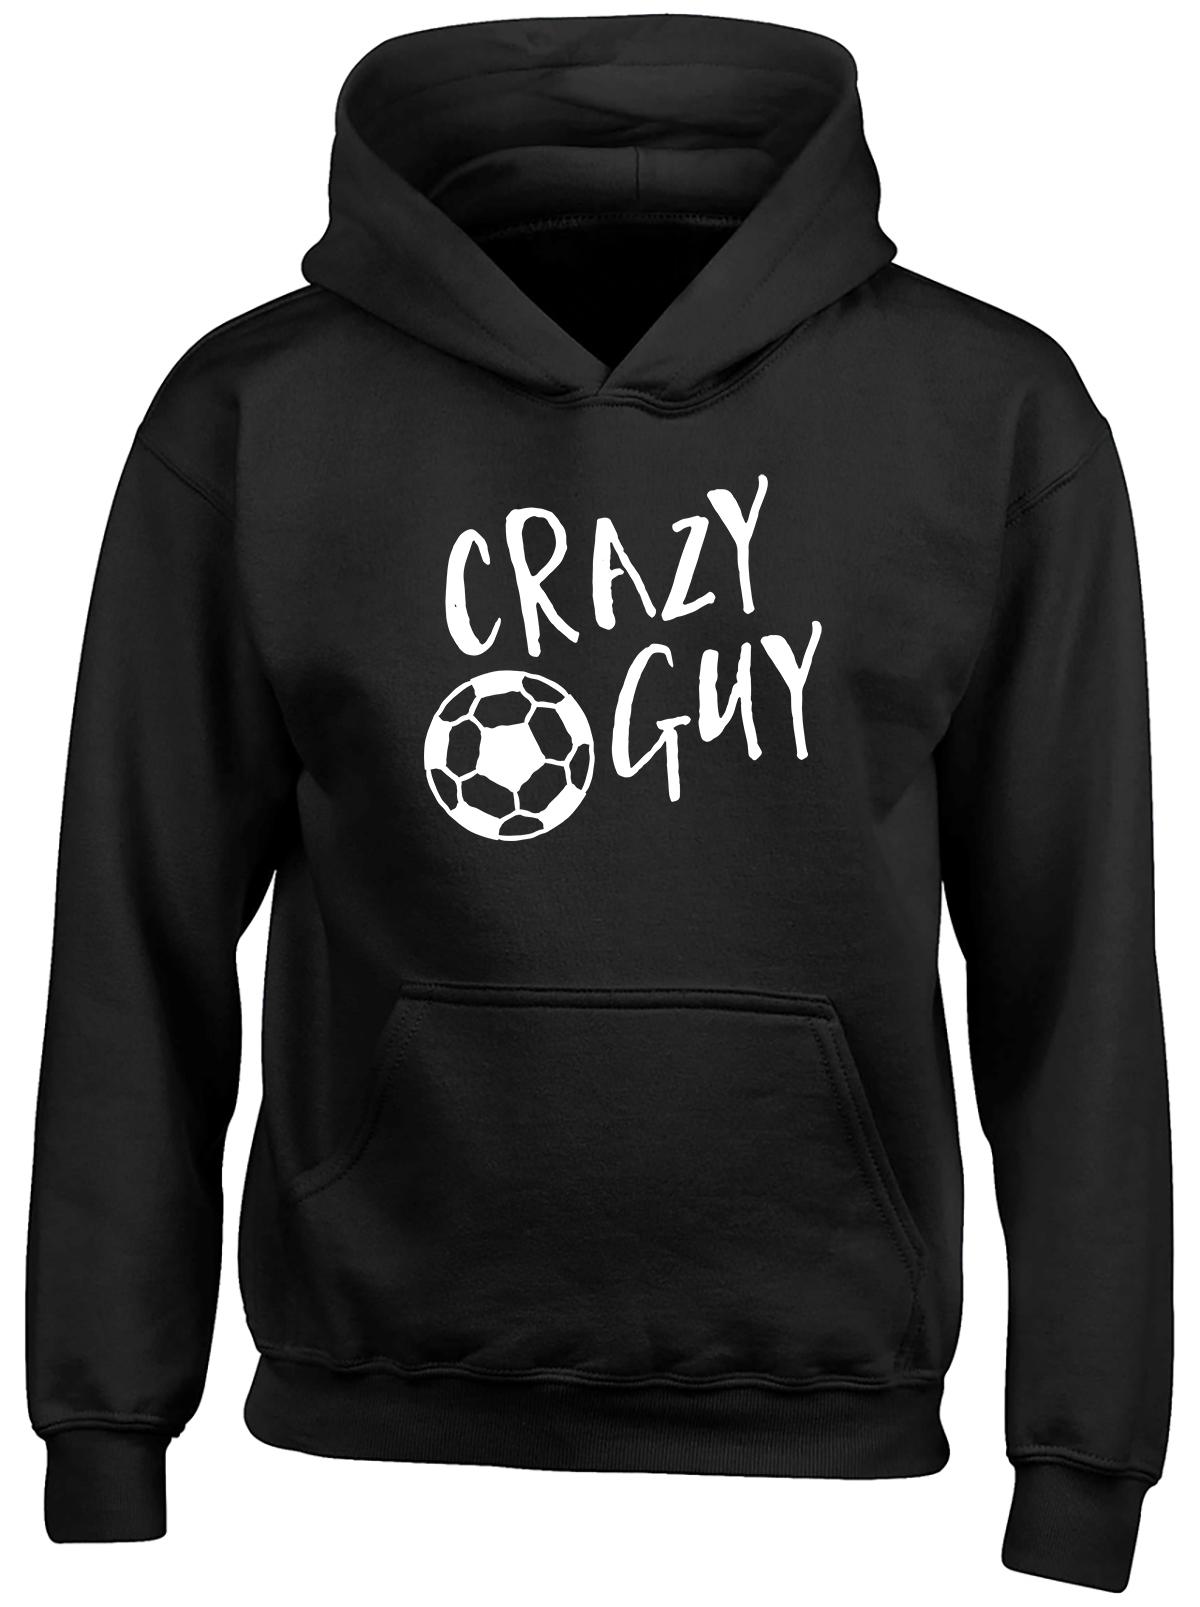 Crazy Football Guy Childrens Kids Hooded Top Hoodie Boys Girls